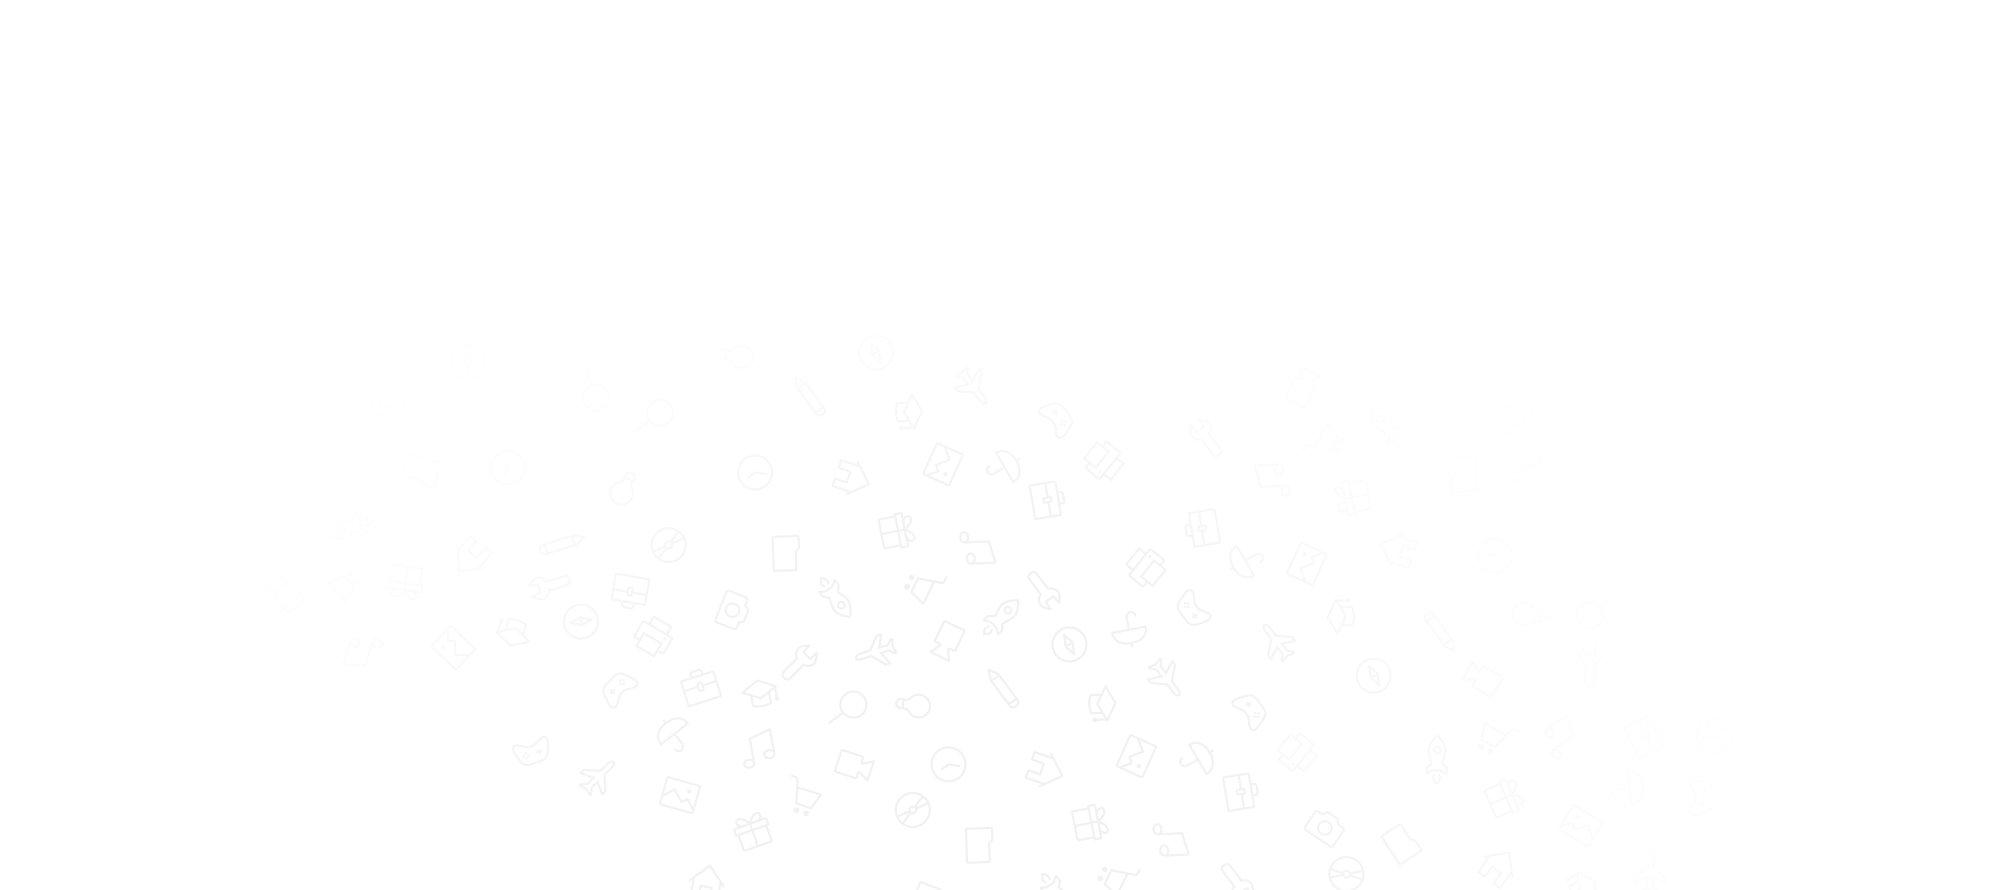 تراکت (شهر دیجیتالی آبمیوه وبستنی فروشان)